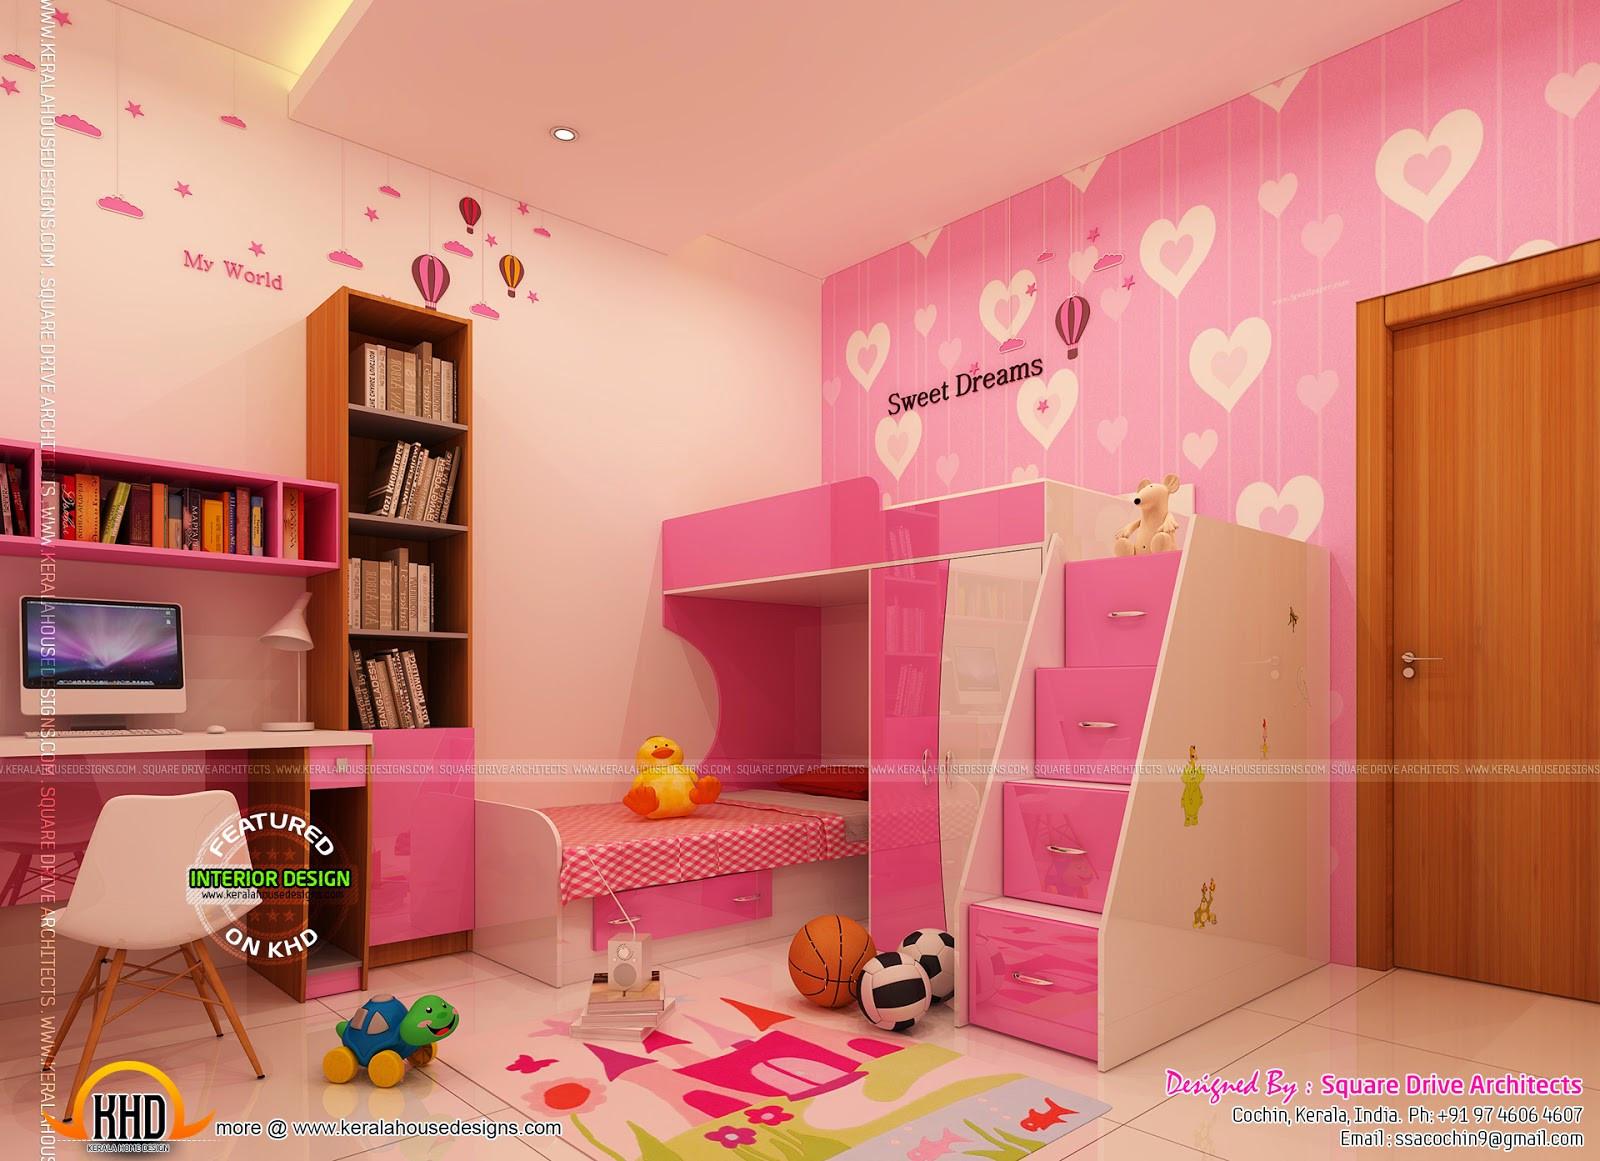 Kids Room Interior  Home interiors designs Kerala home design and floor plans